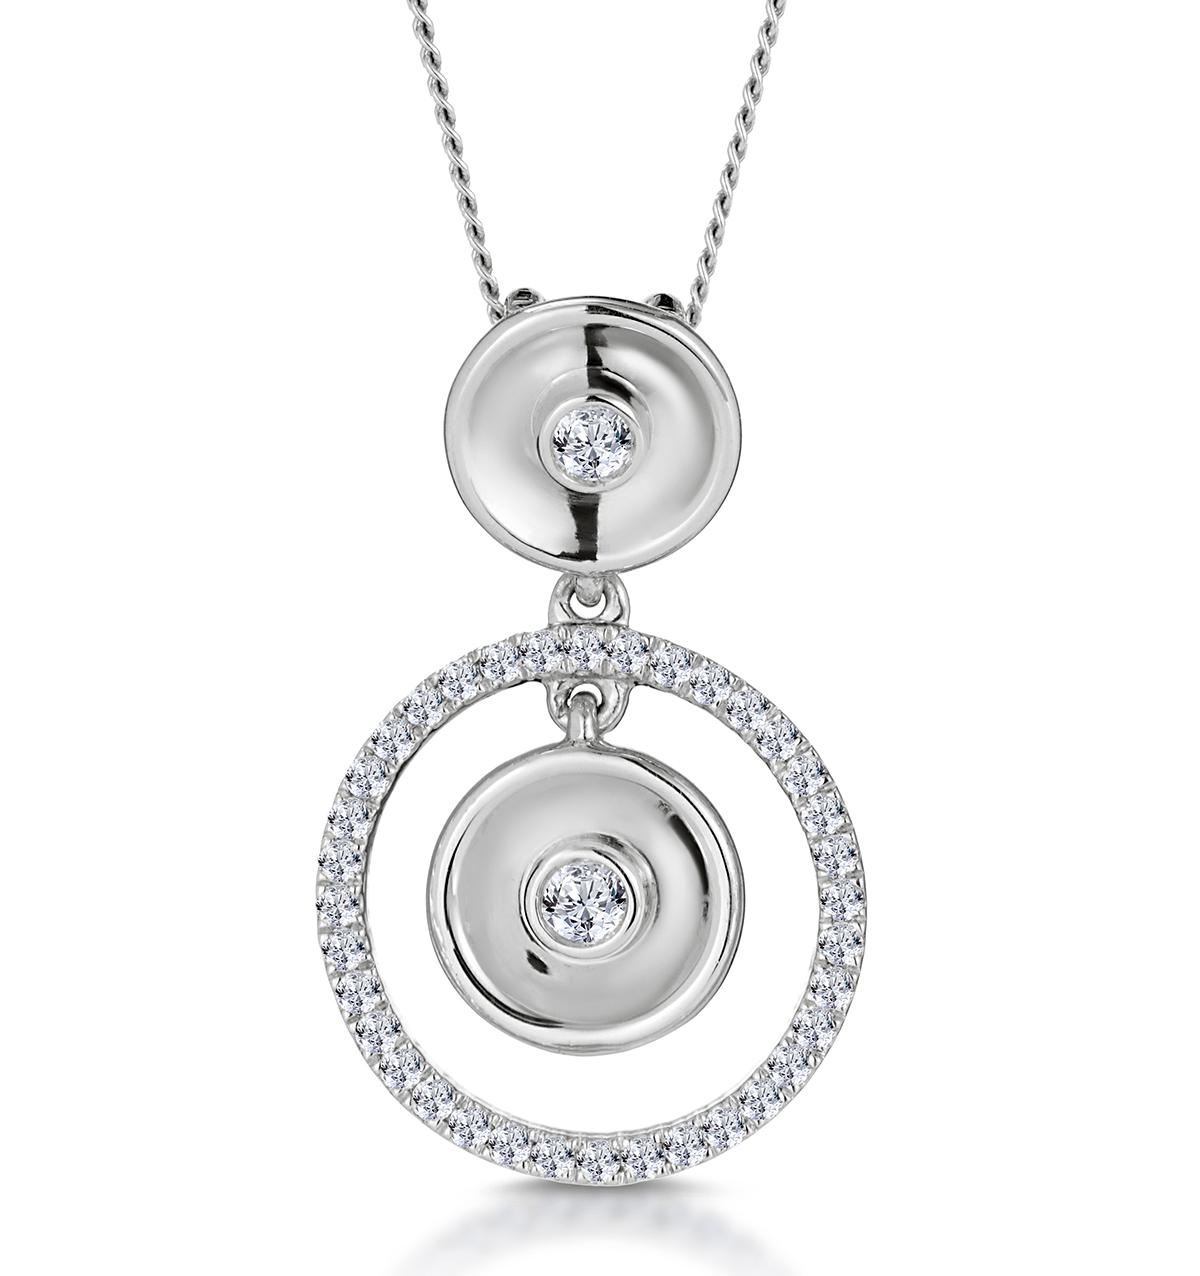 MASAMI DIAMOND HALO CIRCLES NECKLACE 0.20CT SET IN 9K WHITE GOLD